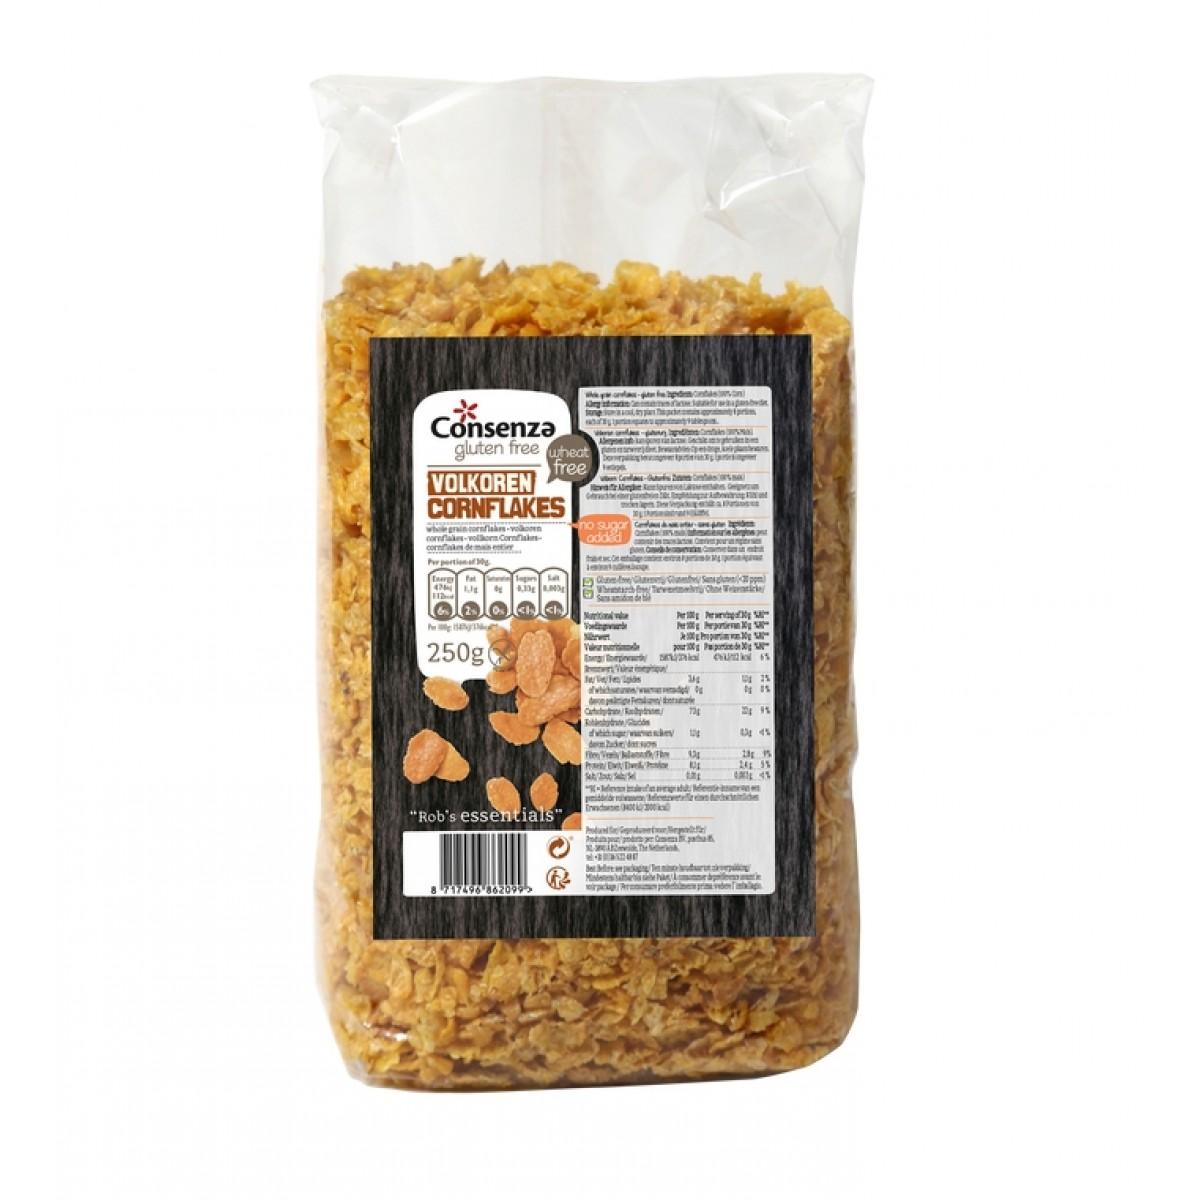 Volkoren Cornflakes